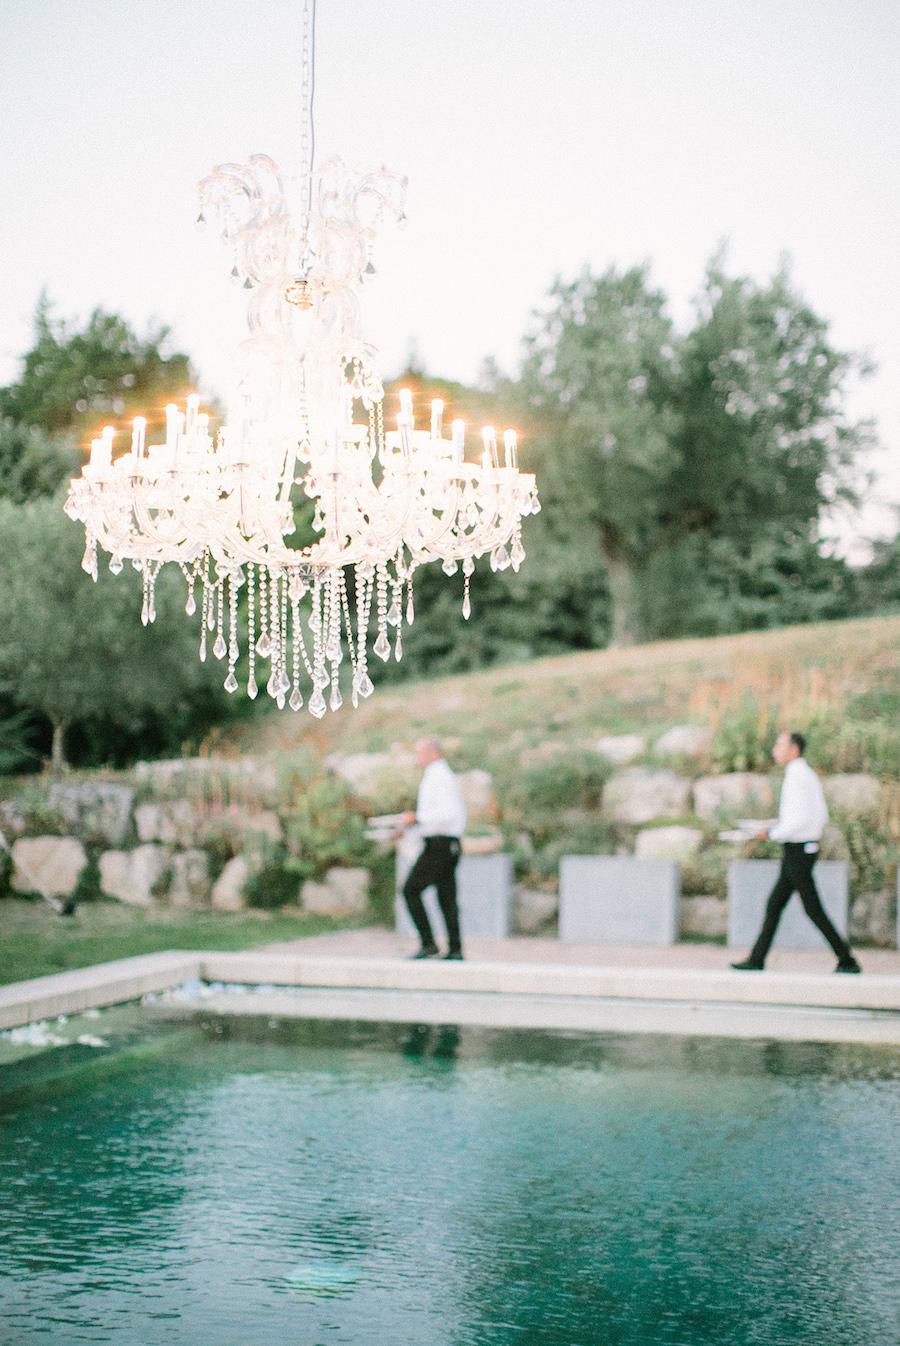 saya-photography-jewish-wedding-provence-rustic-lourmarin-le-galinier-56.jpg